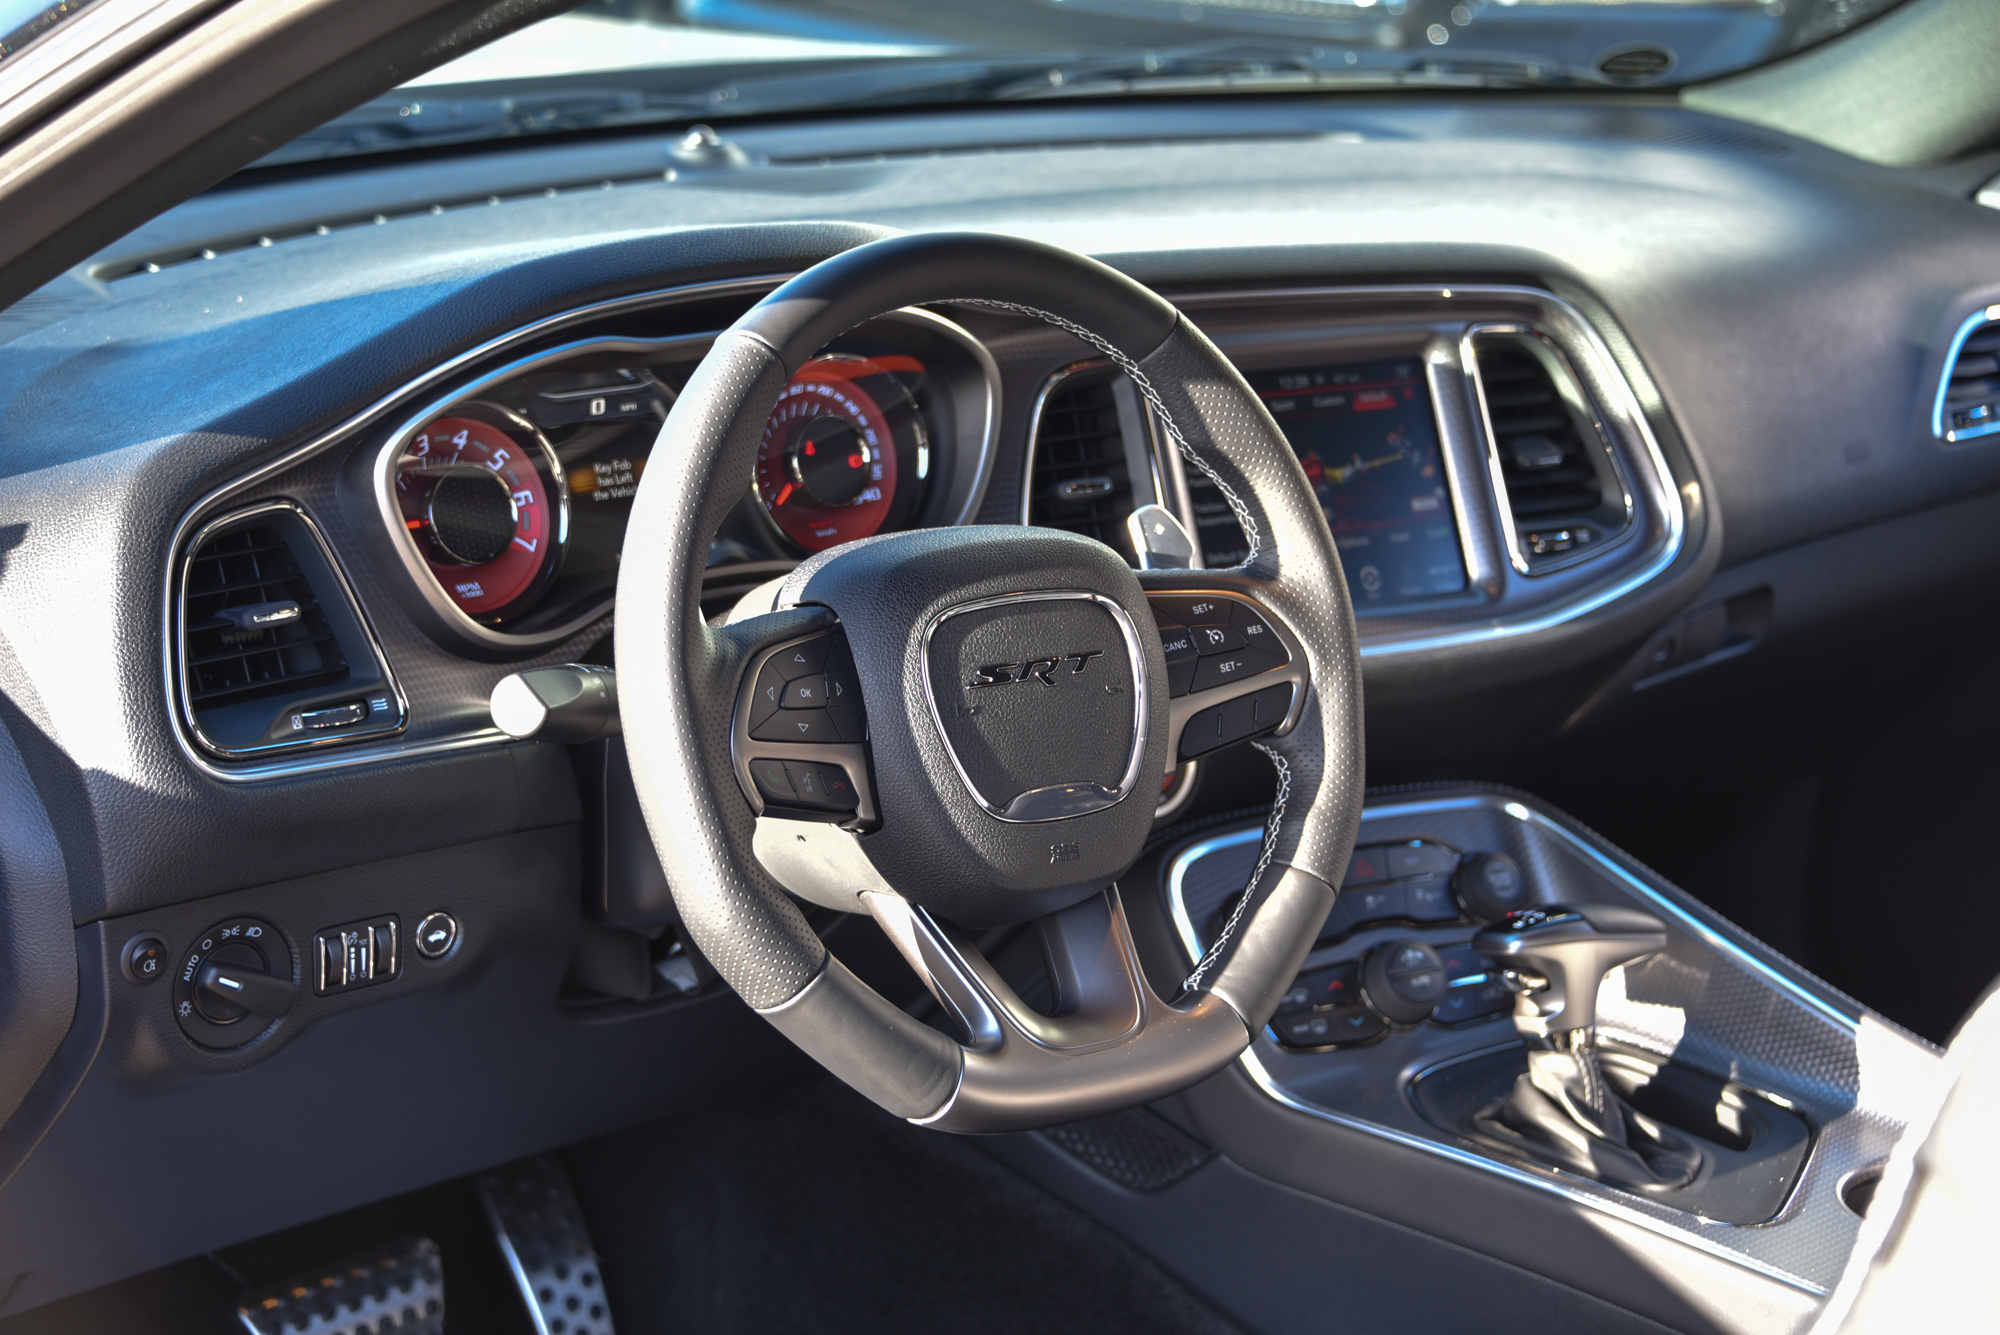 2015 Dodge Challenger Hellcat For Sale >> 2015 Challenger Hellcat Auto – David Boatwright